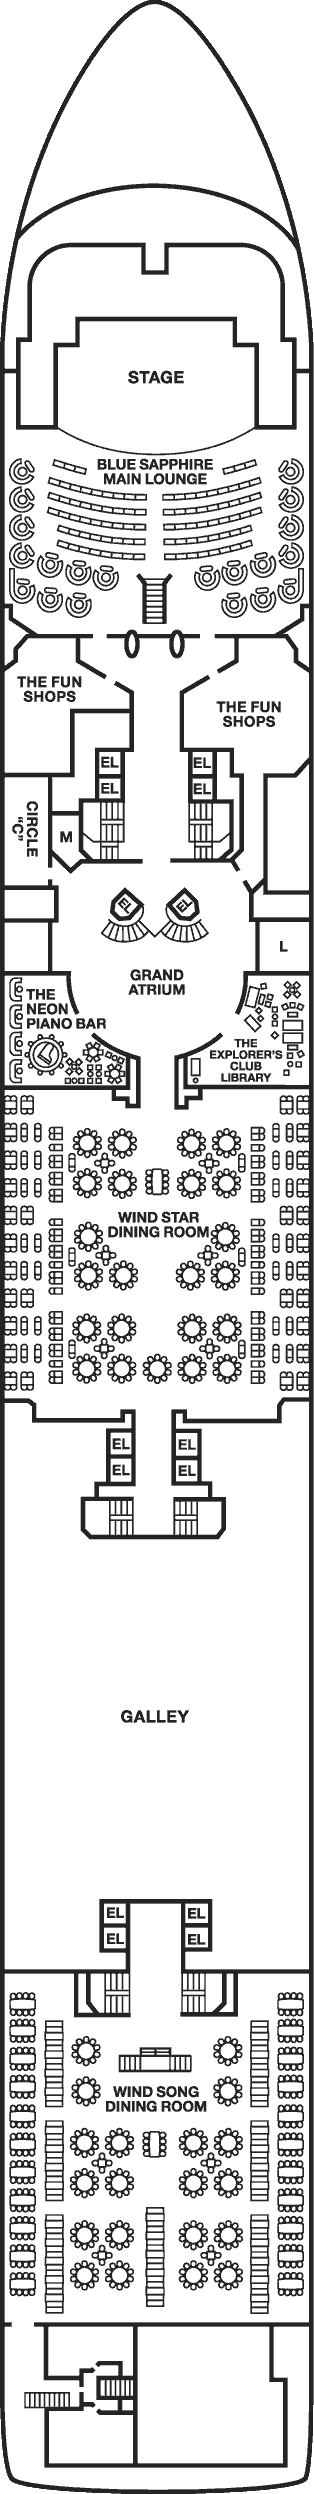 carnival ecstasy deck plans